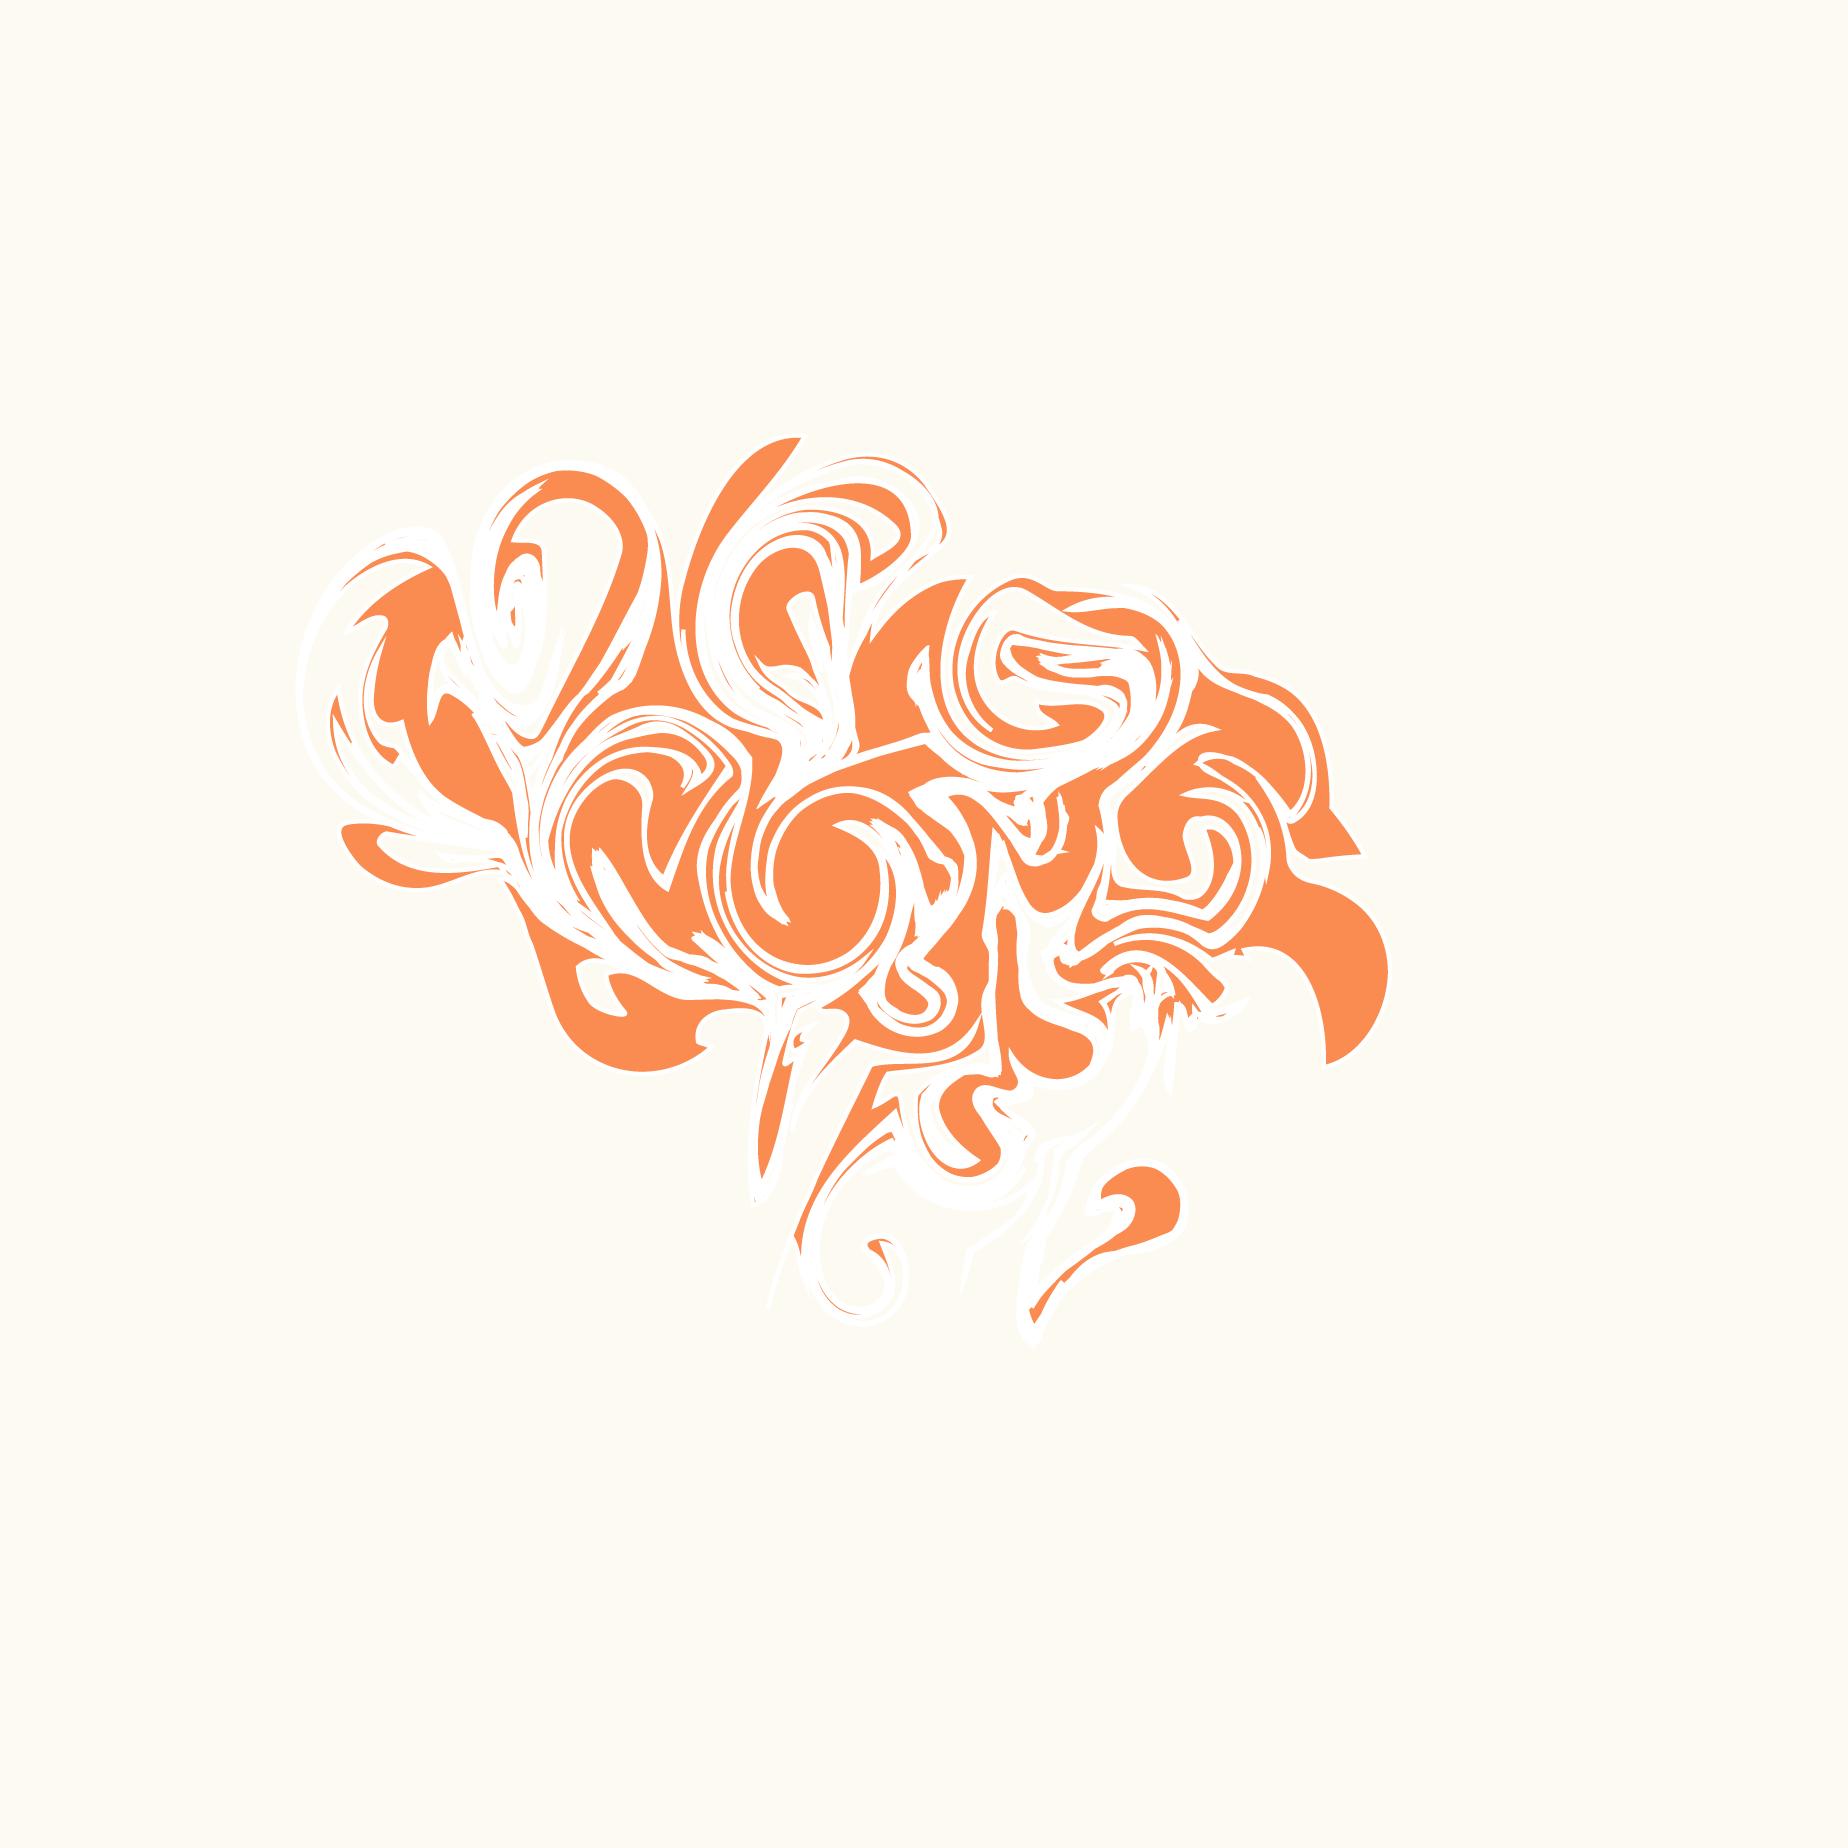 Küchendesign für bungalowhaus designed by mona morali flowersdns on instagram graphic